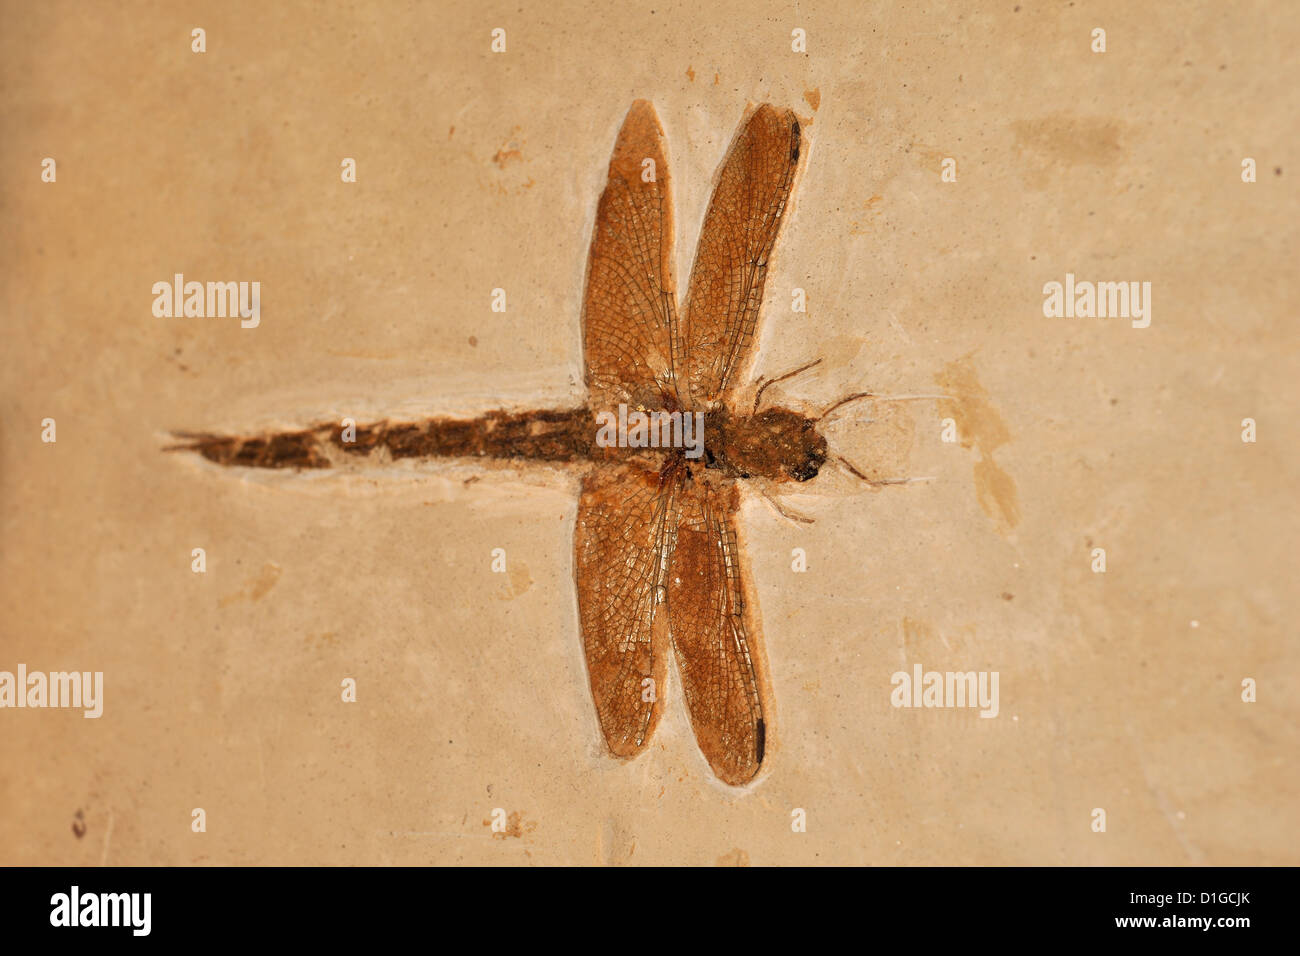 Fossil dragonfly, Odonata, Cretaceous Period, Grado, Italy - Stock Image